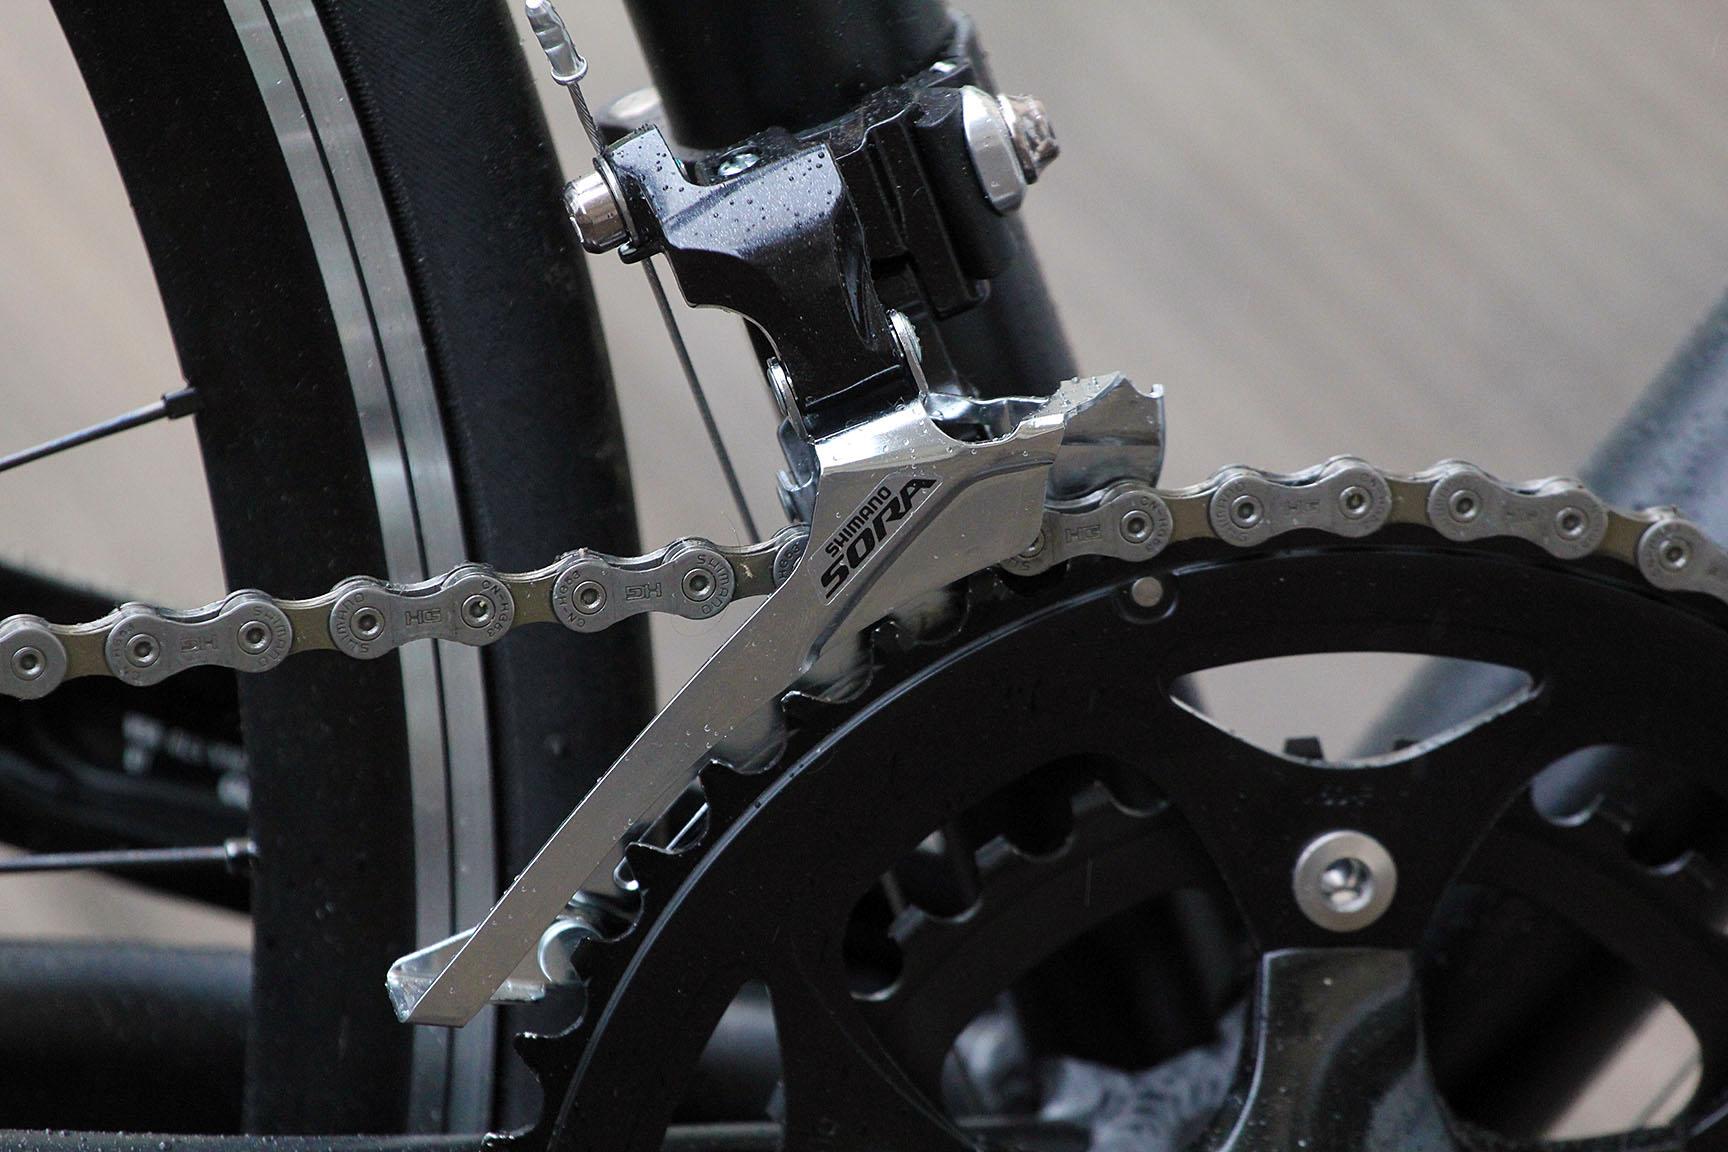 Shimano RD-R3000 Sora GS Rear 9-Speed Bike Cycle Cycling Derailleur